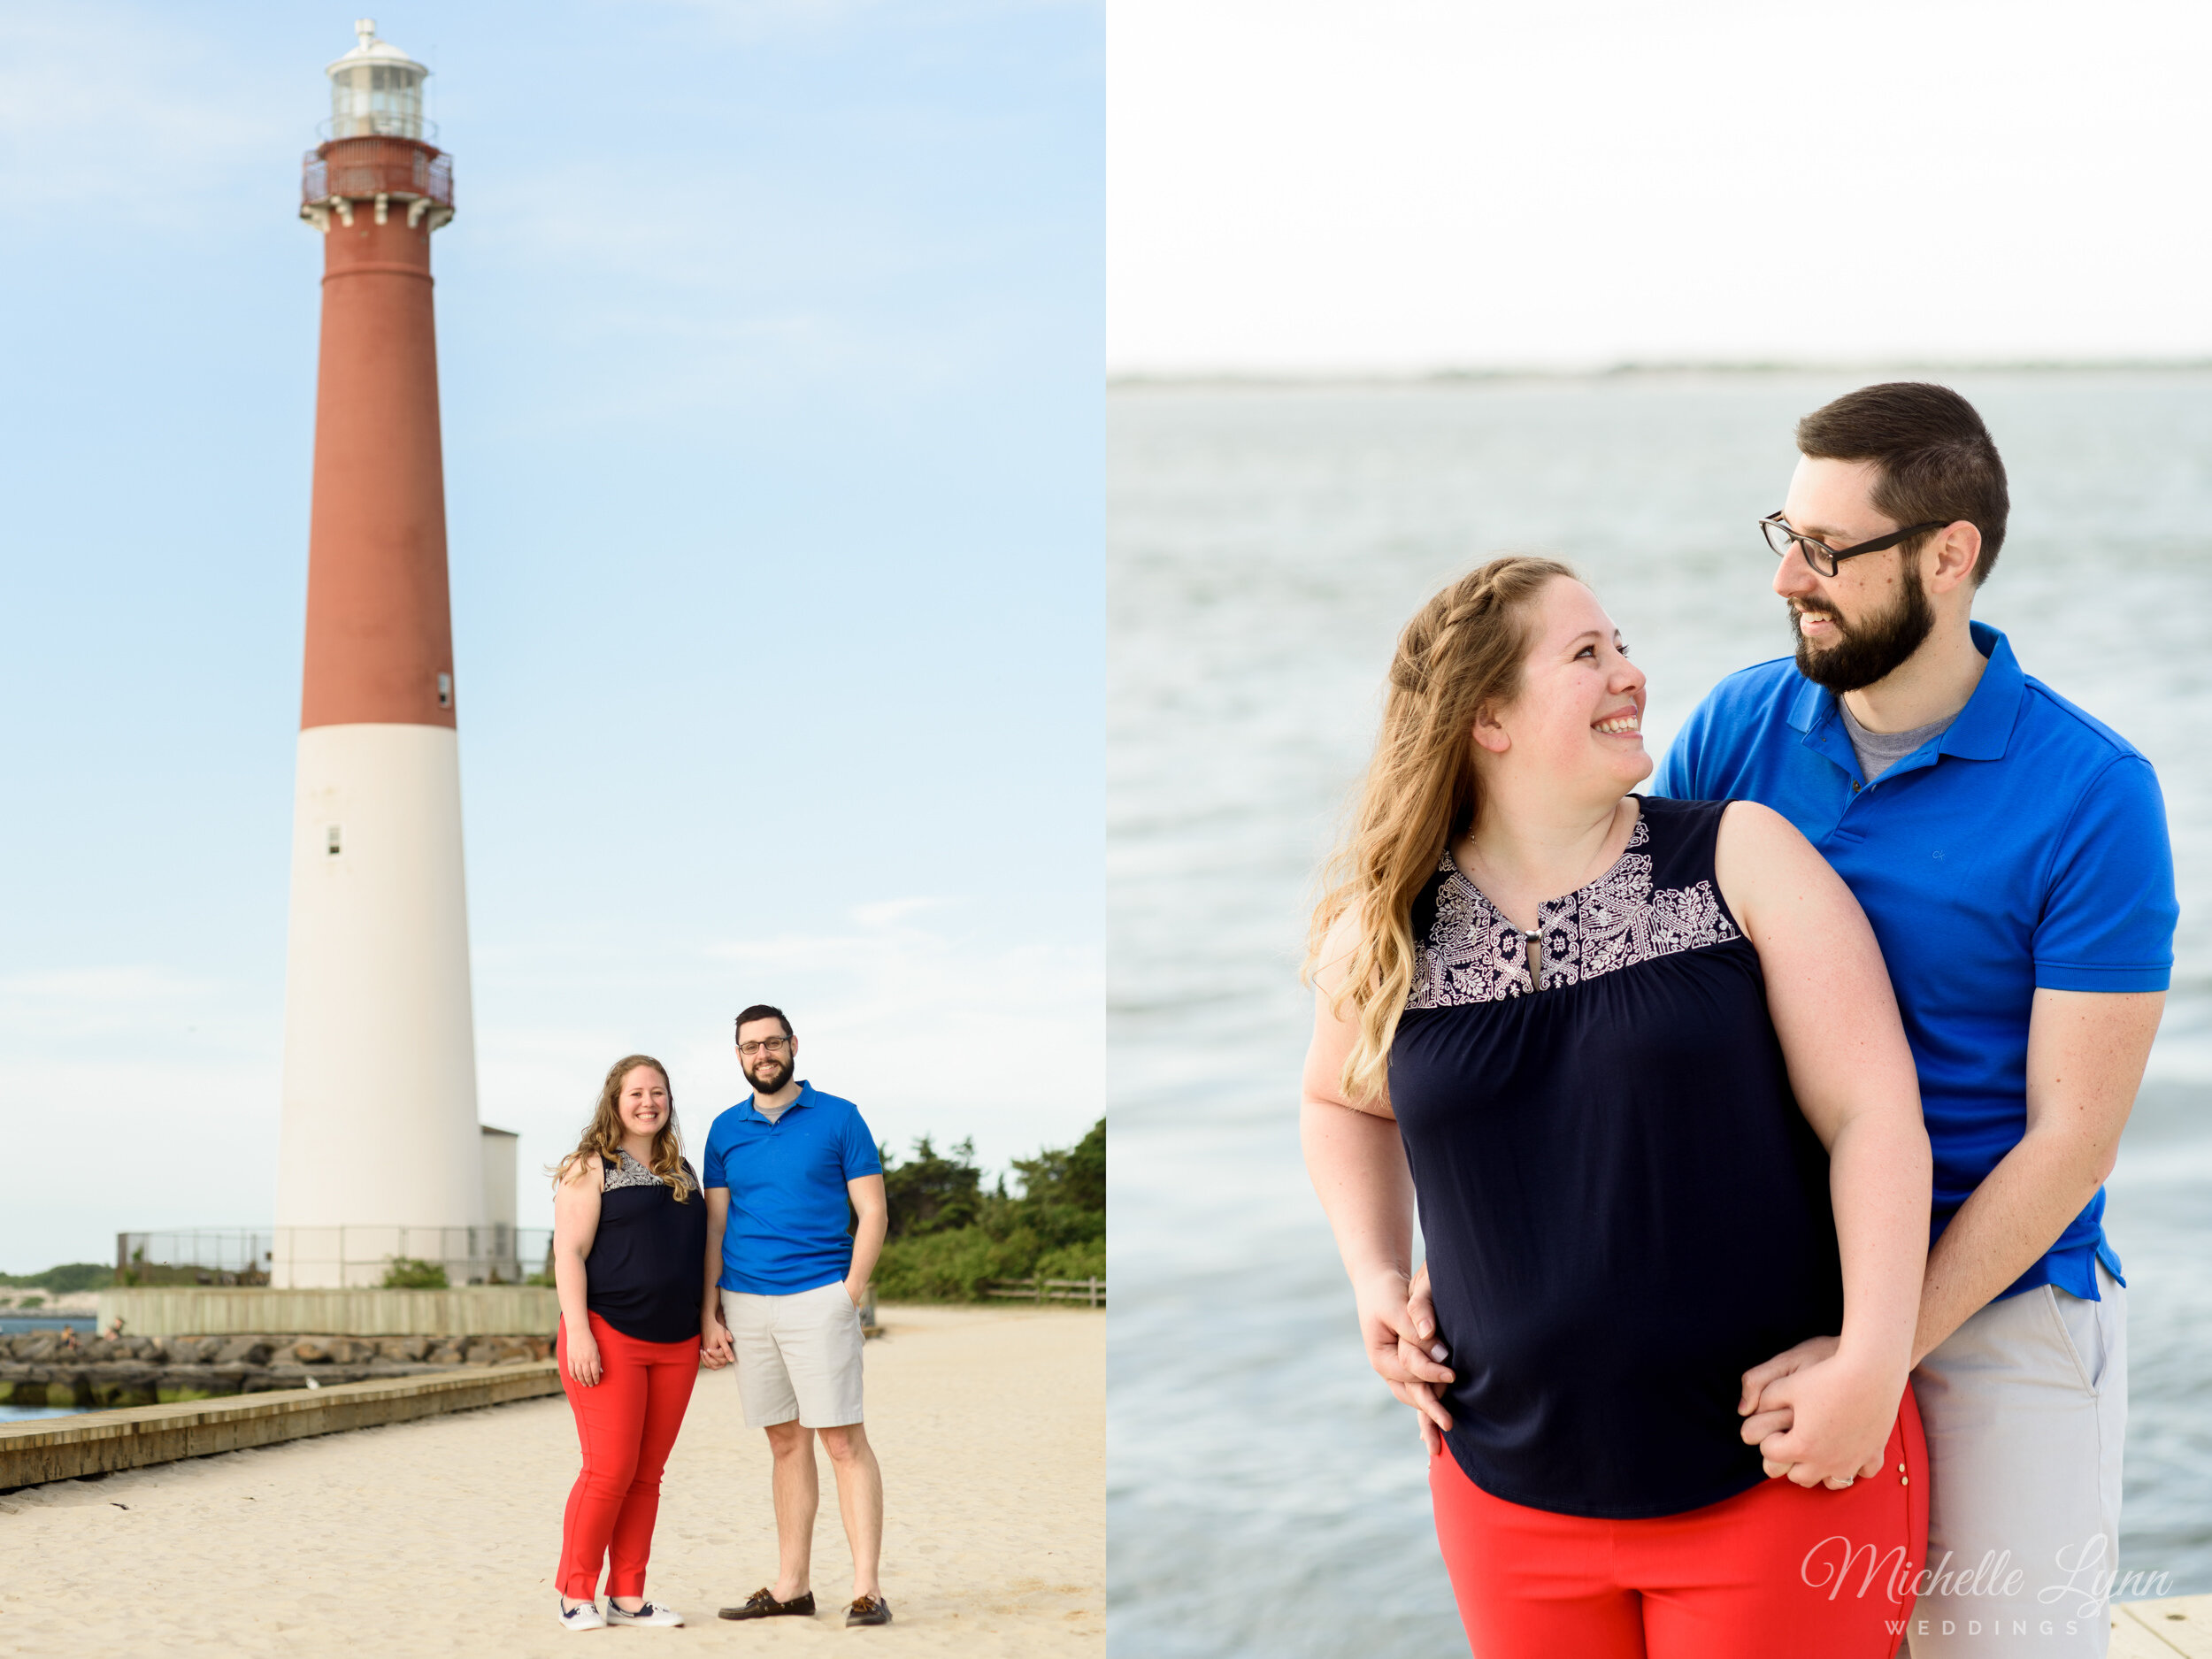 barnegat-lighthouse-engagement-photos-michelle-lynn-weddings-3.jpg